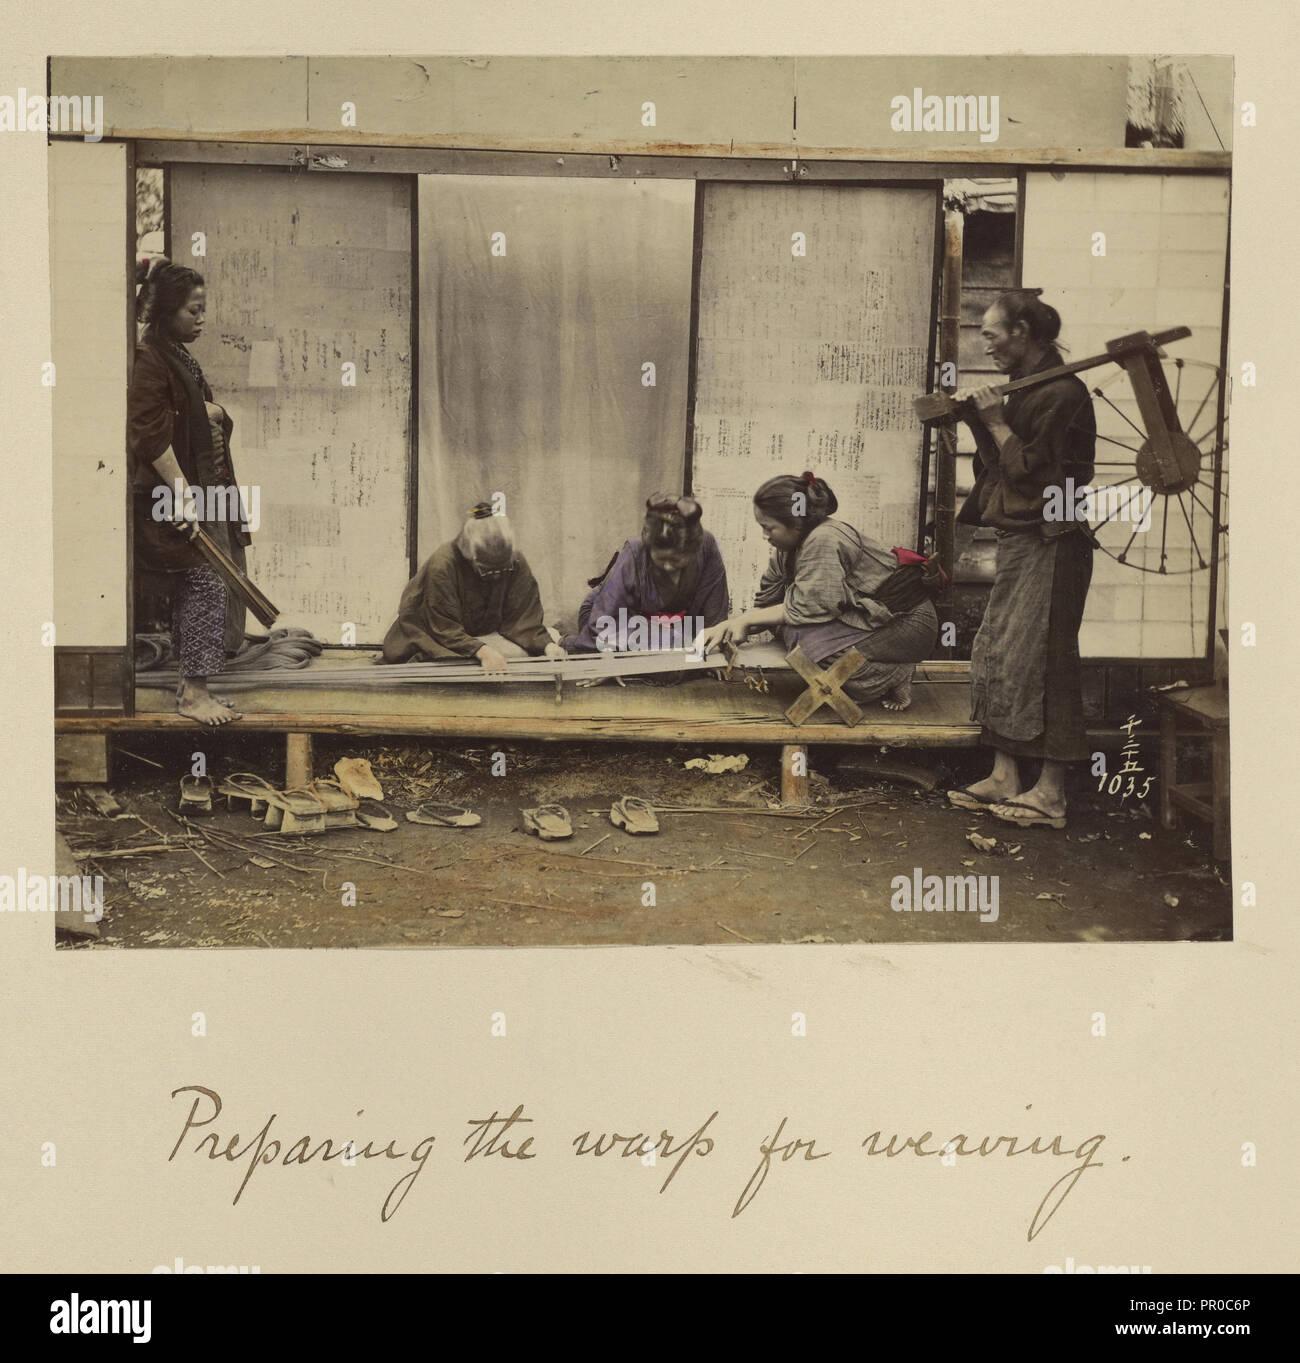 Preparing the Warp for Weaving; Shinichi Suzuki, Japanese, 1835 - 1919, Japan; about 1873 - 1883; Hand-colored Albumen silver - Stock Image